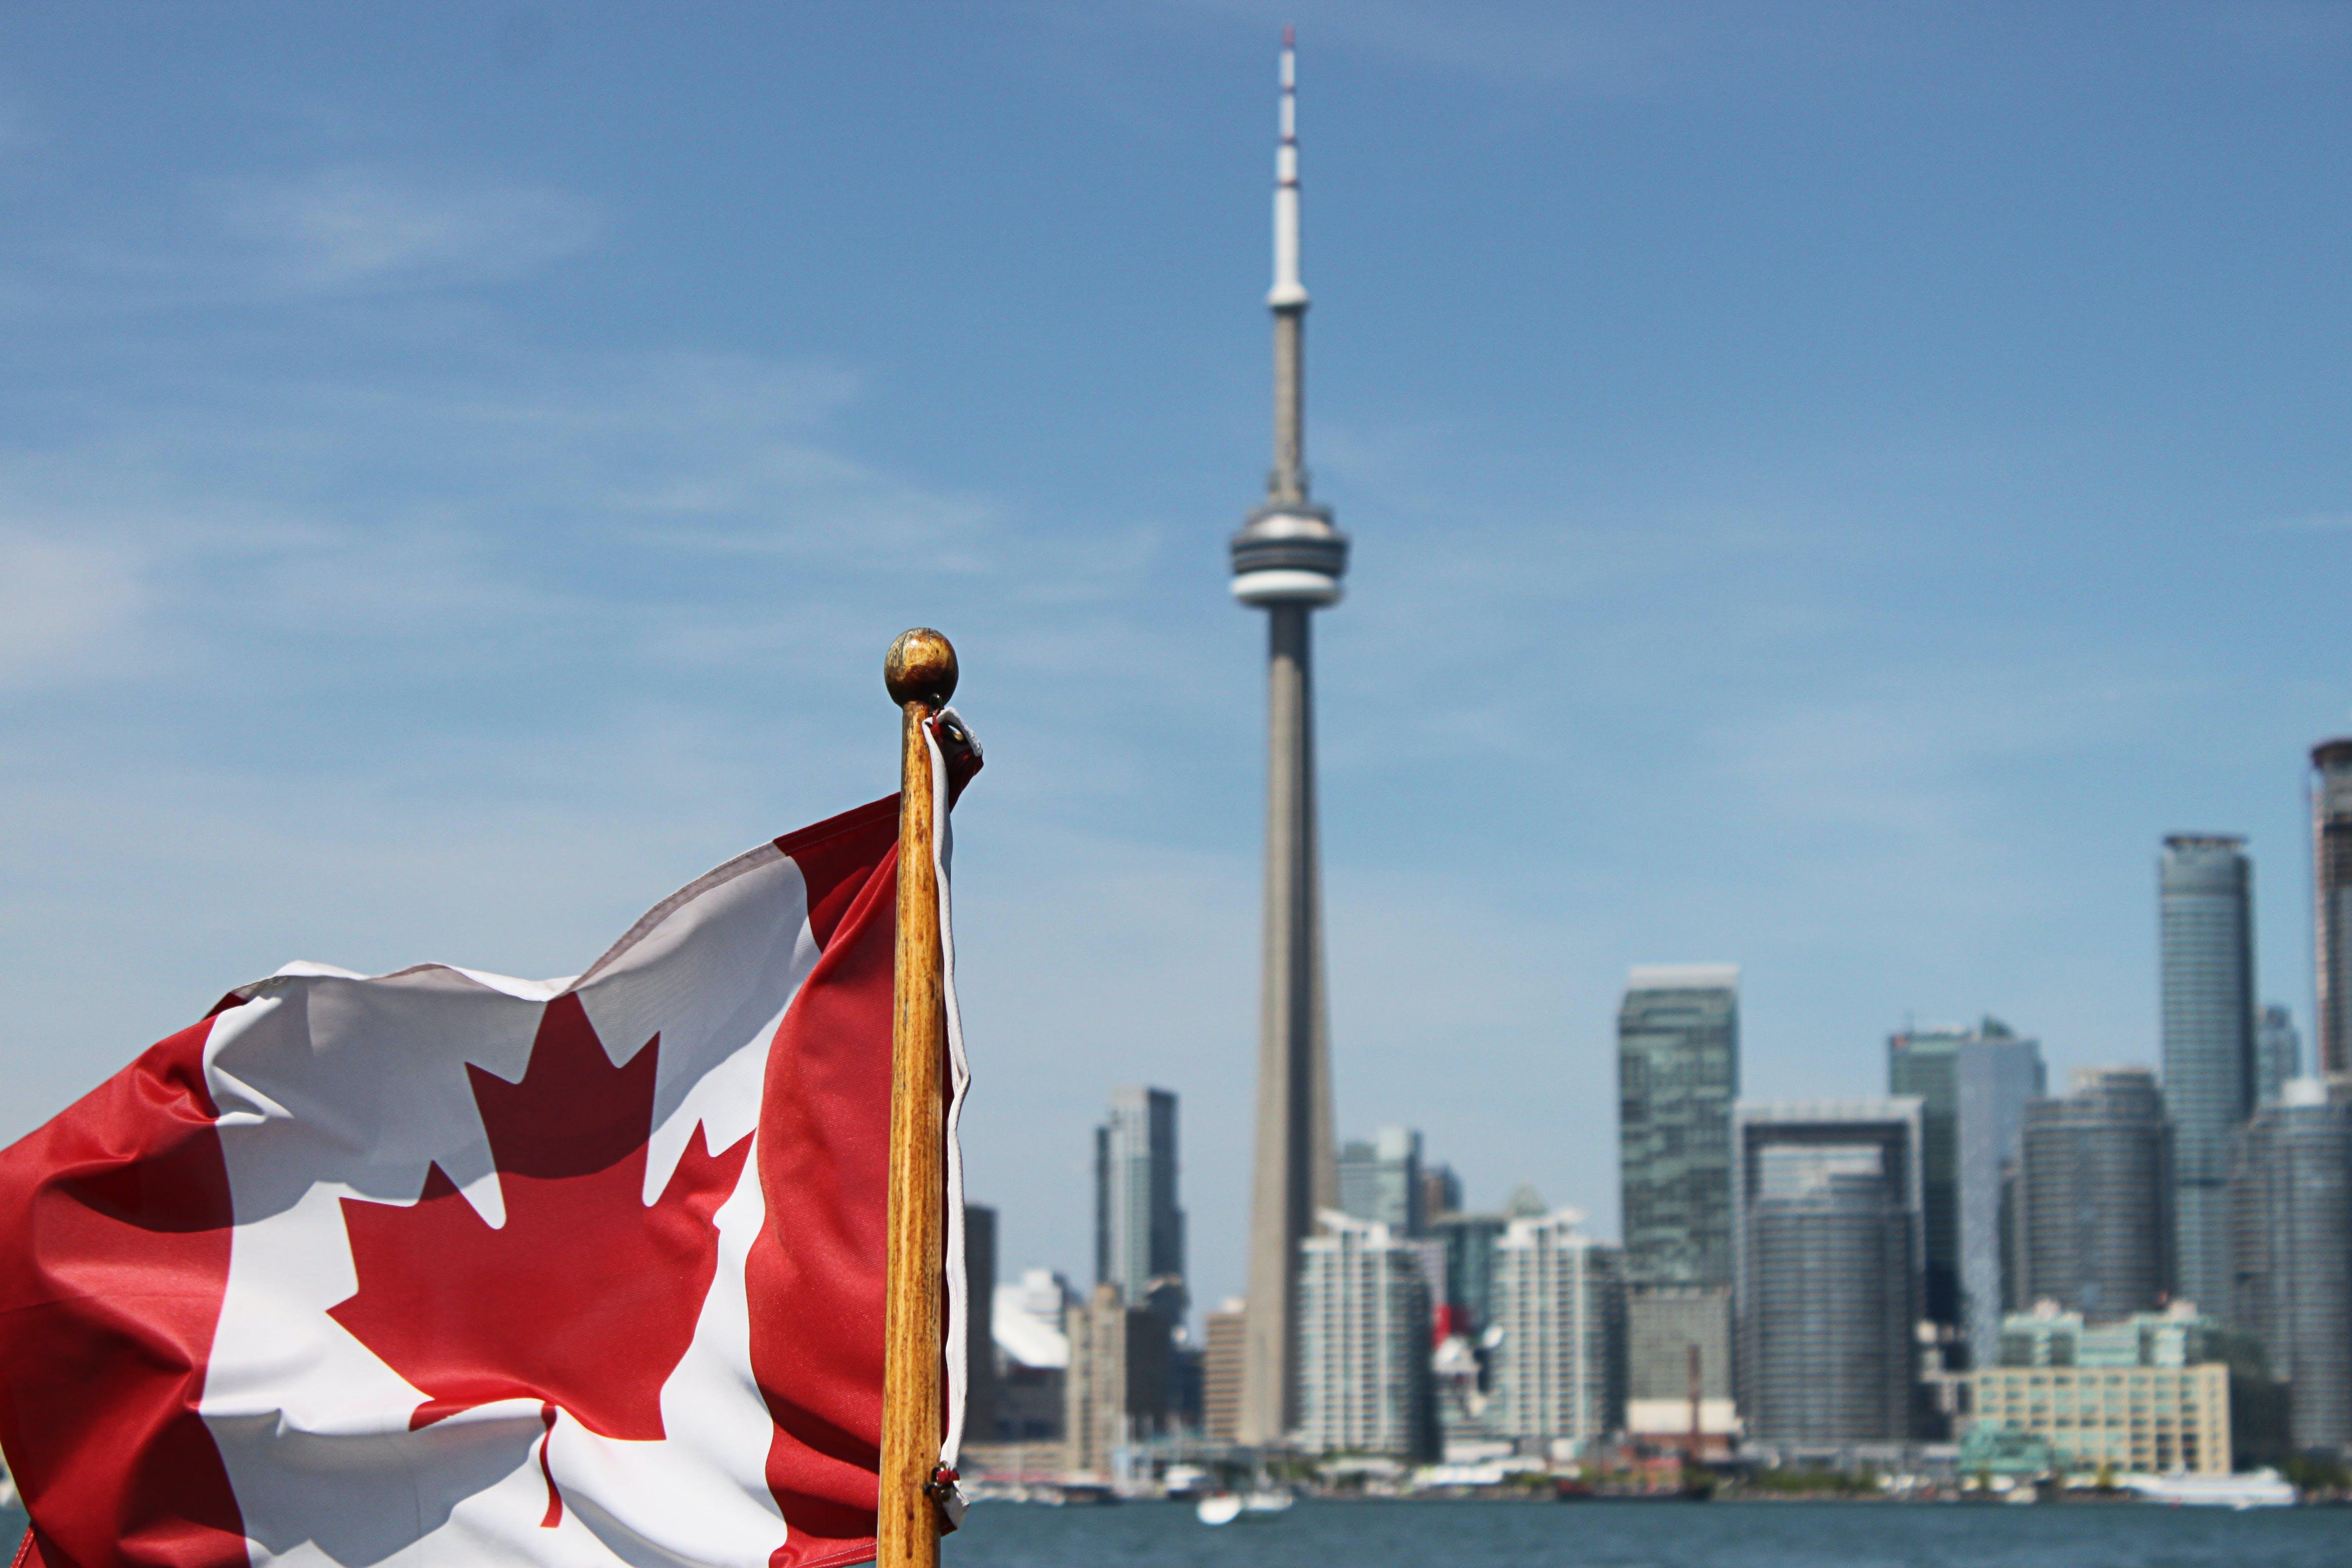 Free stock photo of Toronto